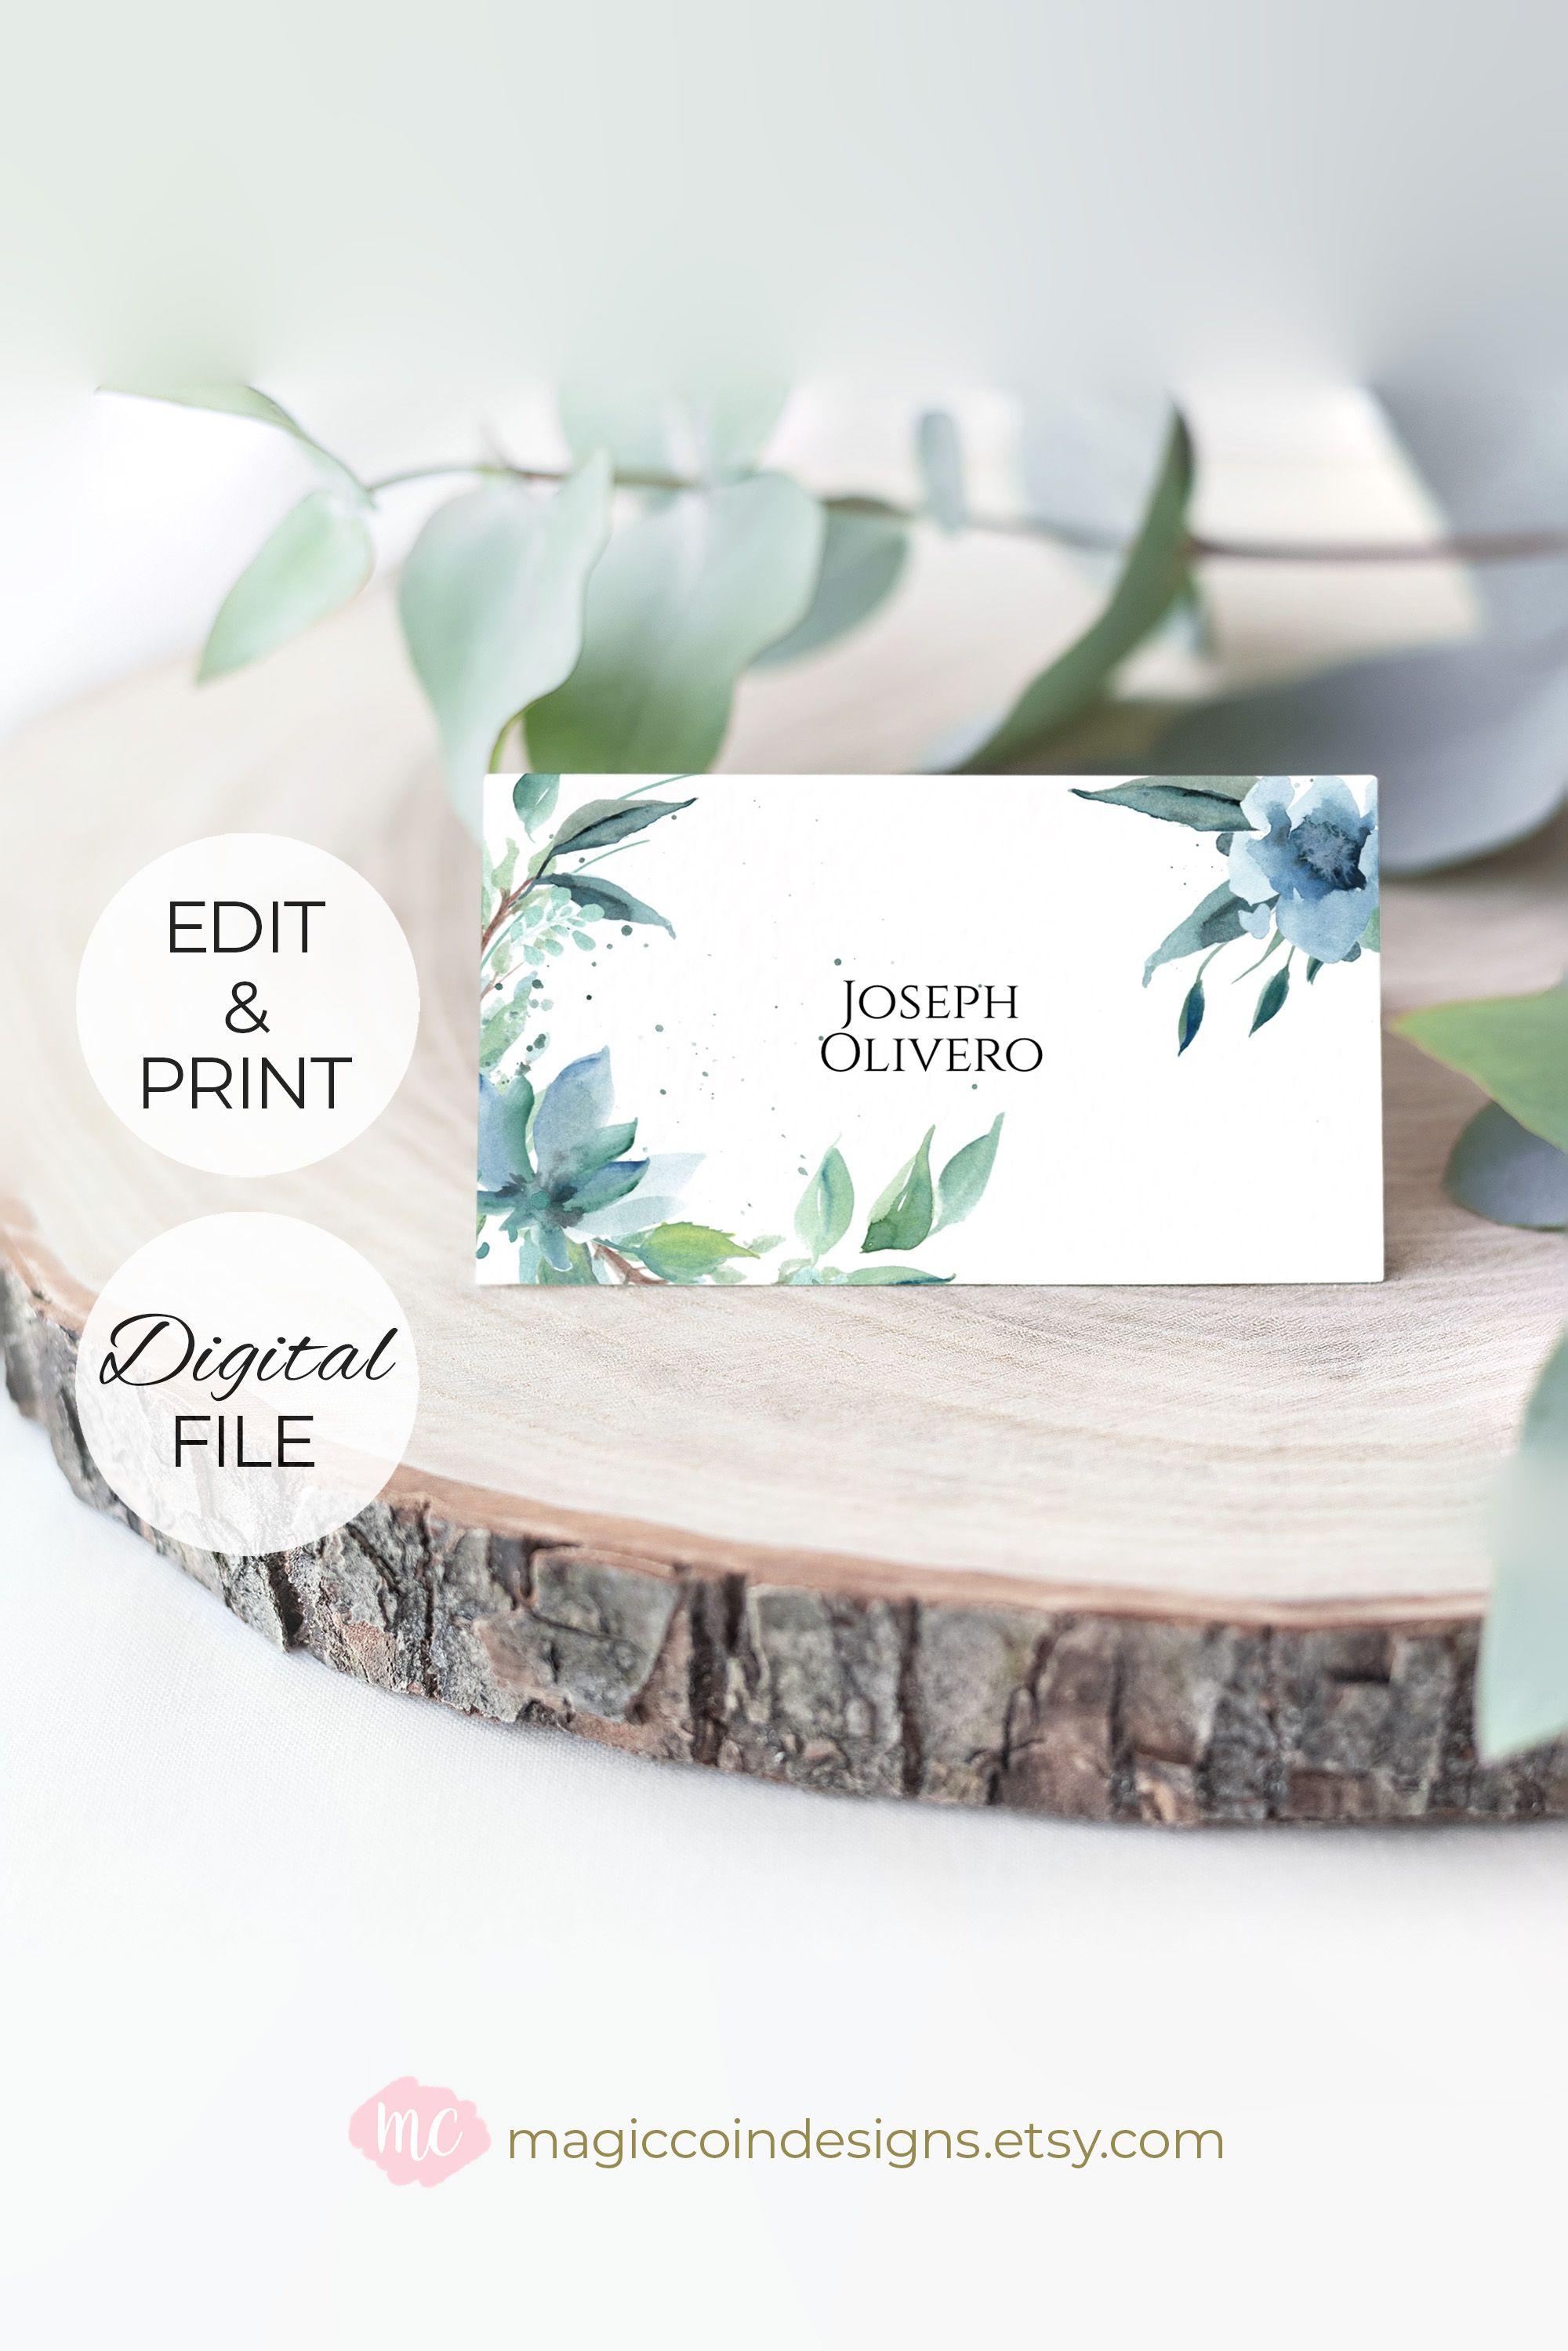 Floral Place Card Blue Floral Wedding Place Cards Template Etsy Wedding Place Card Templates Wedding Place Cards Place Card Template